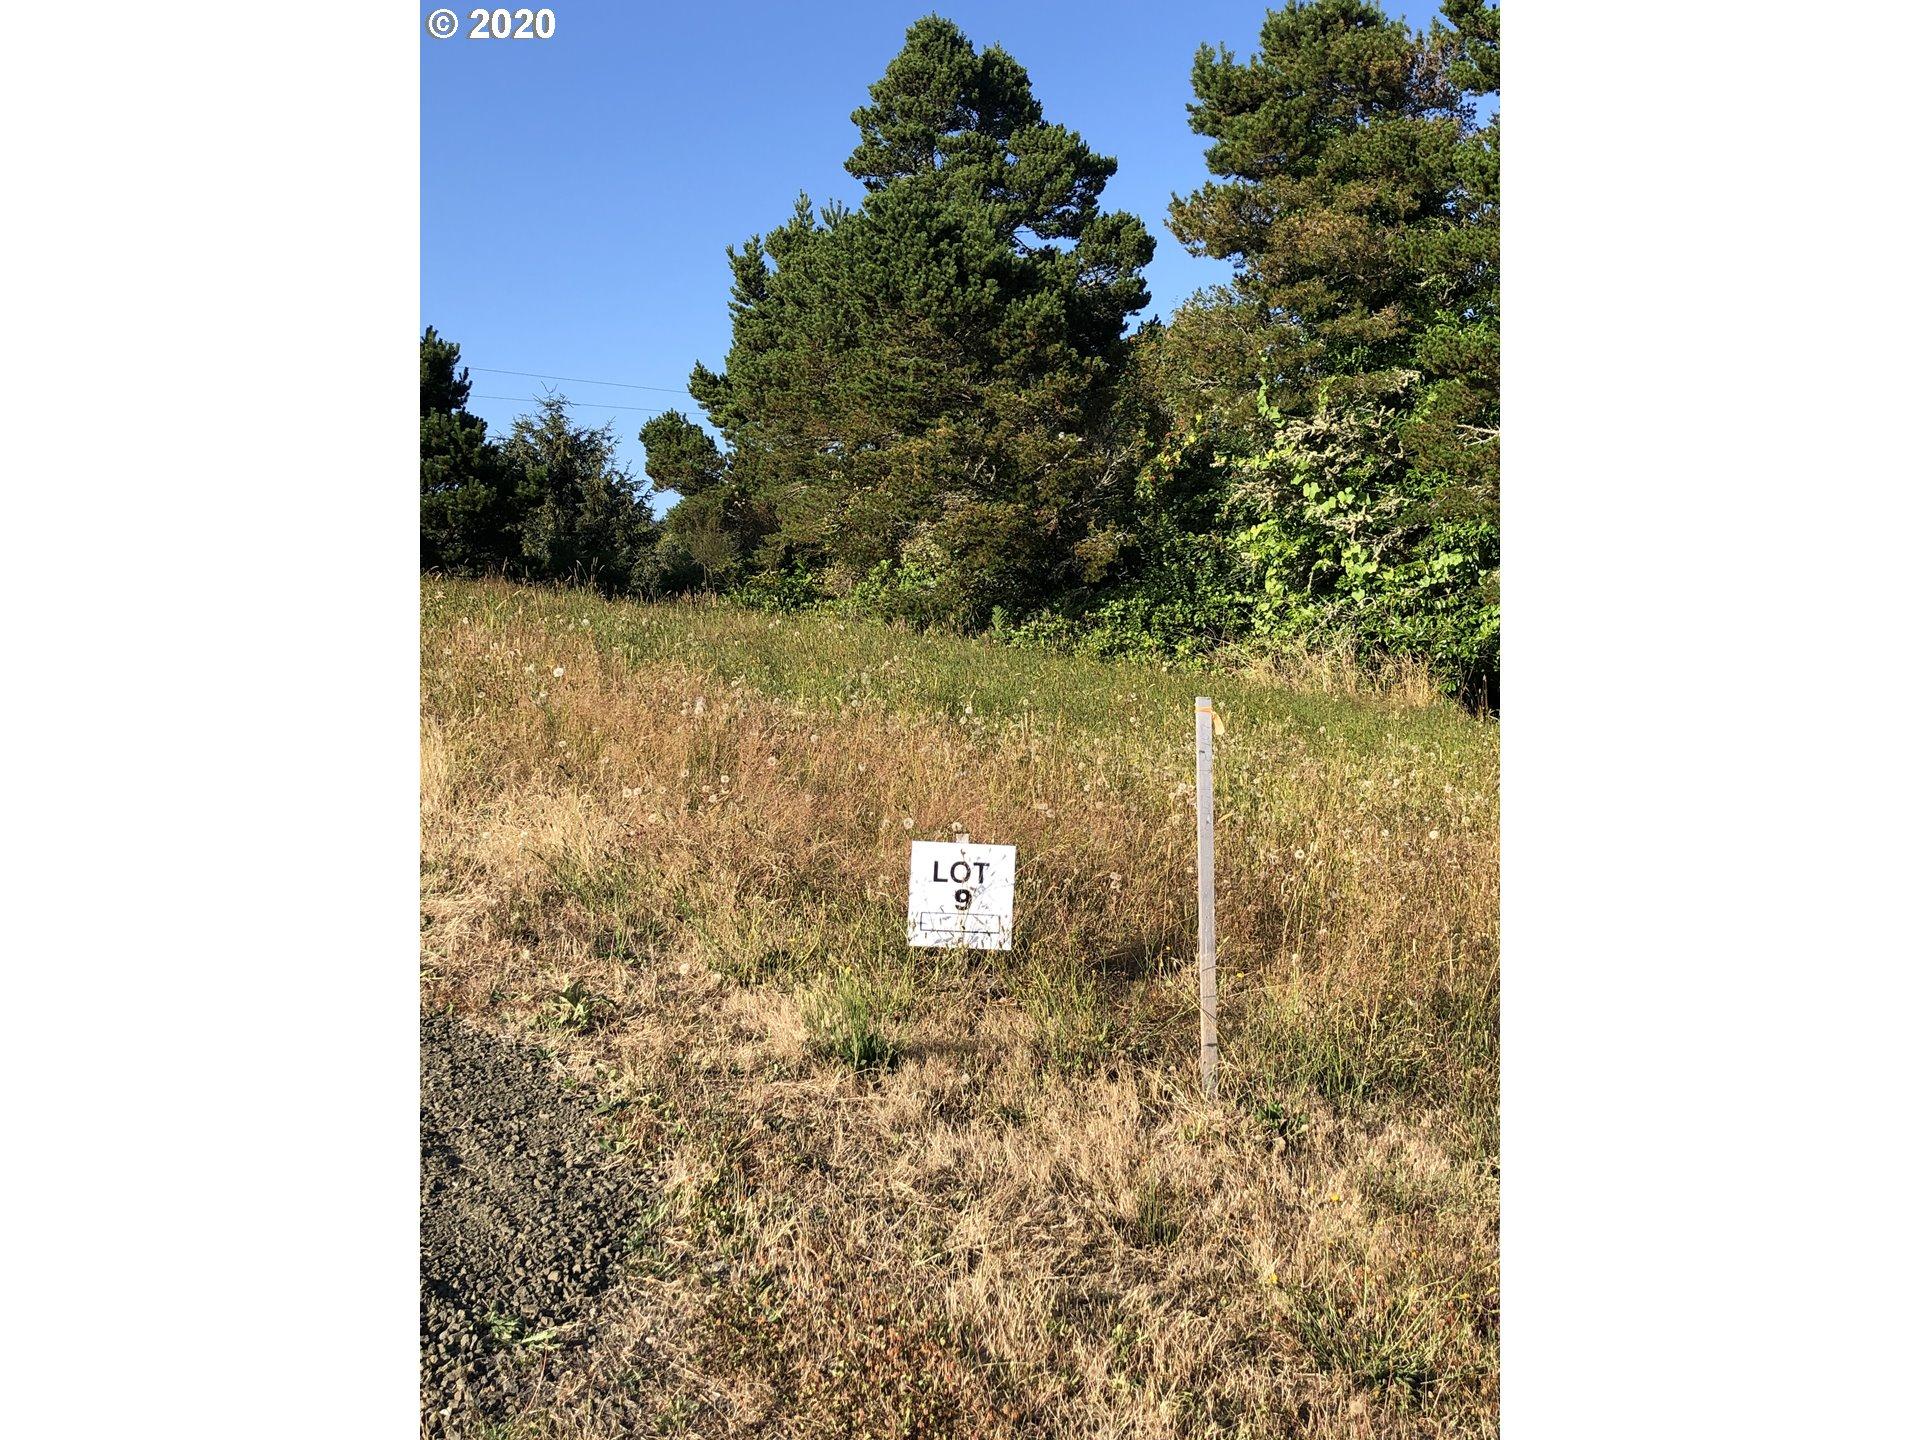 Bay CIR Lot 9, Bay City, Oregon 97107, ,Lots And Land,For Sale,Bay CIR Lot 9,20343766